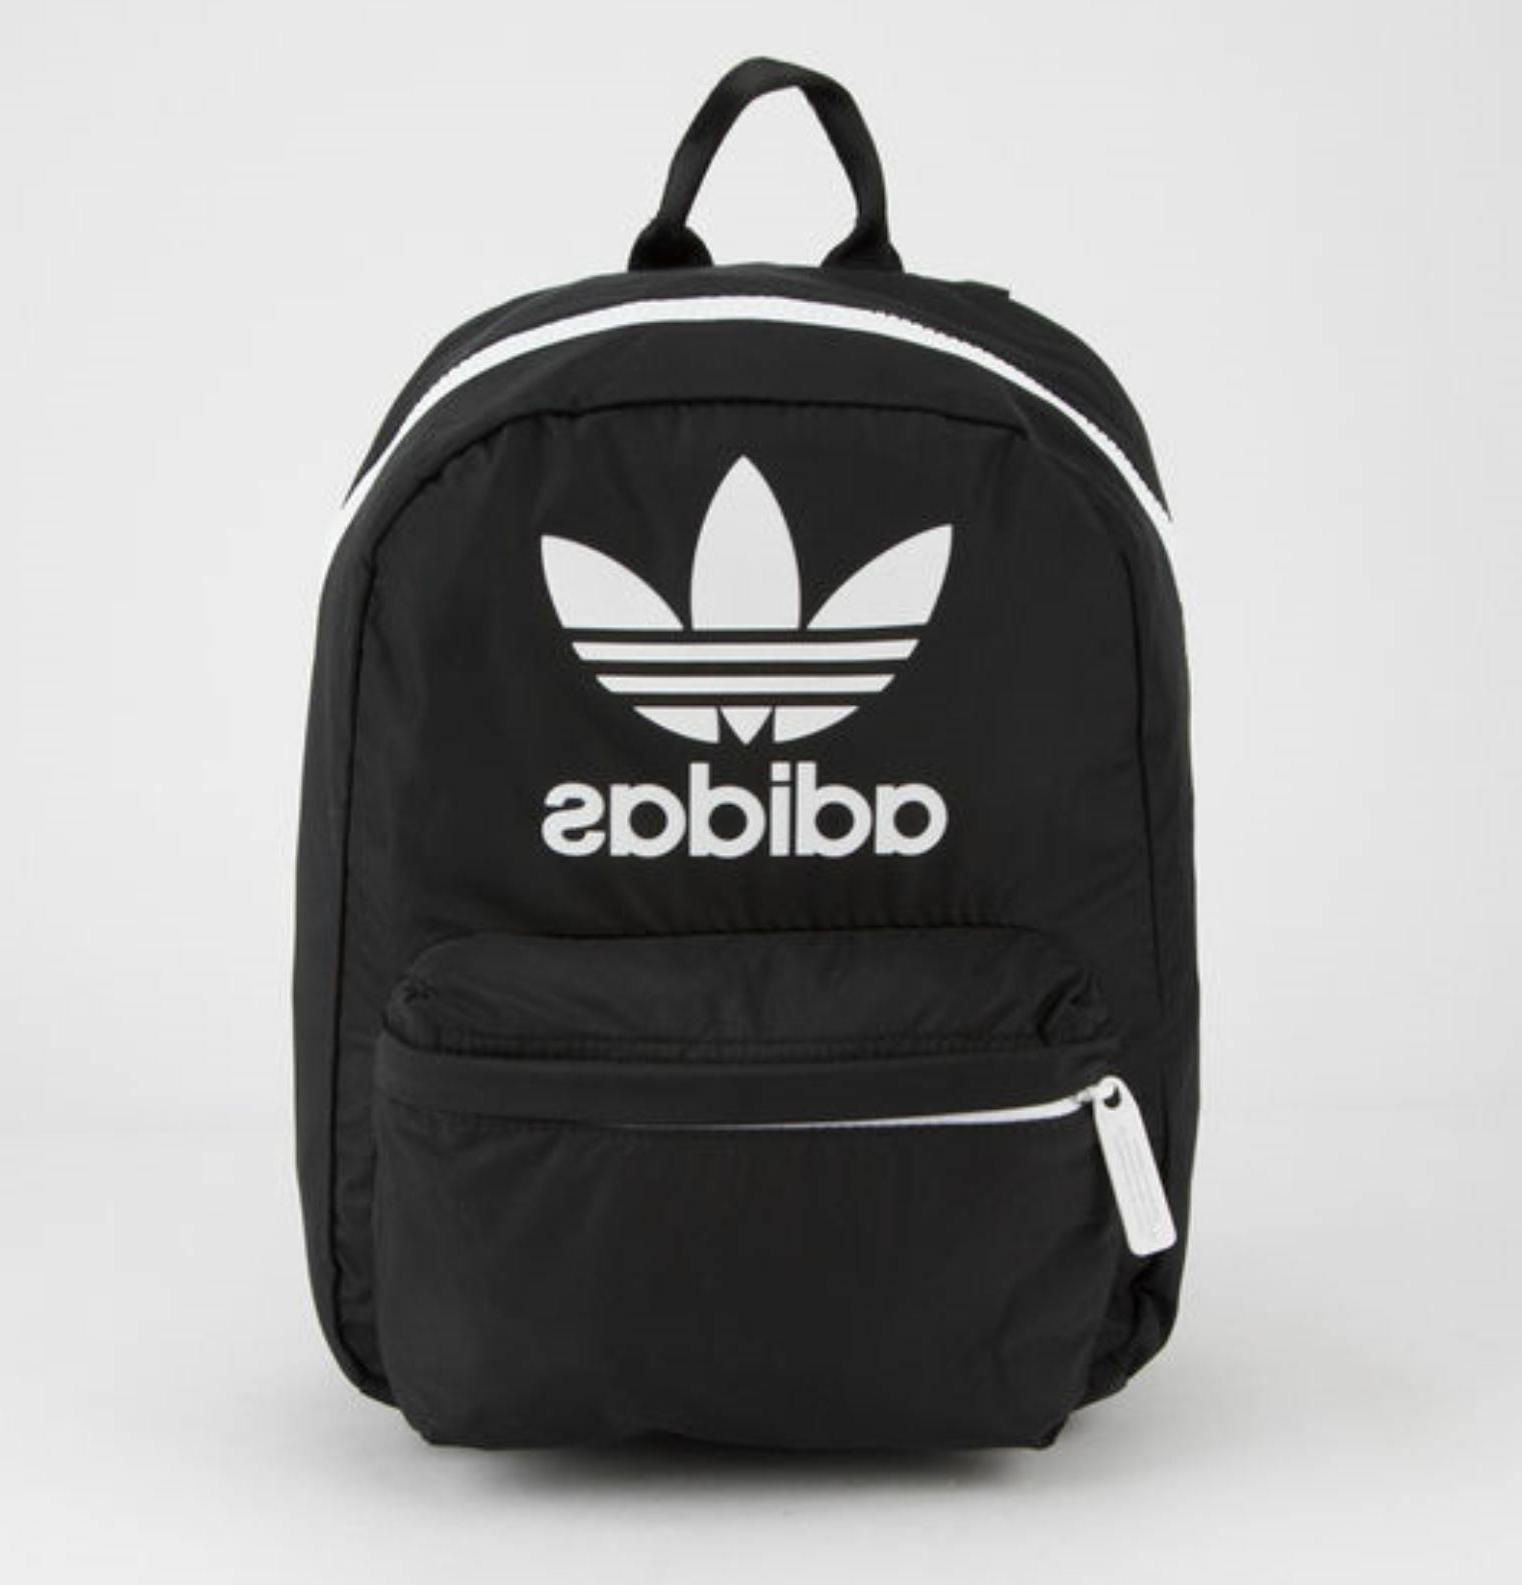 NEW MINI COMPACT BAG #5145051